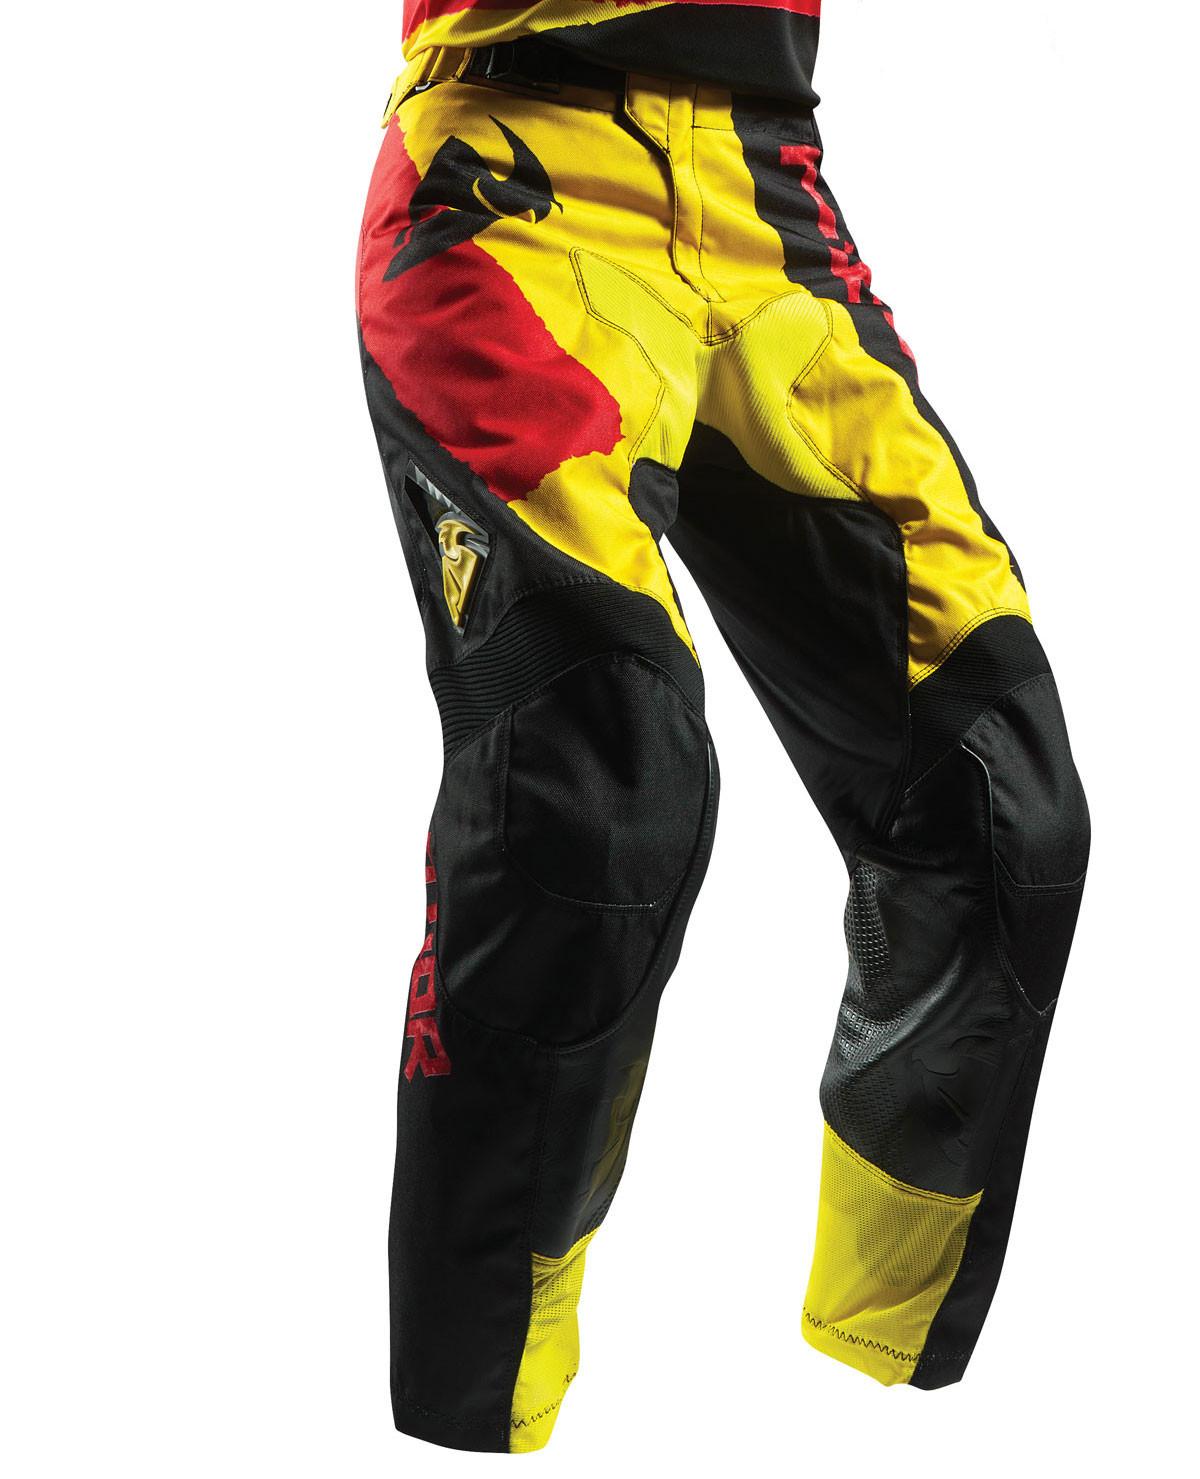 Thor Giallo Rosso Pantaloni Pulse Cross wqACUxaB